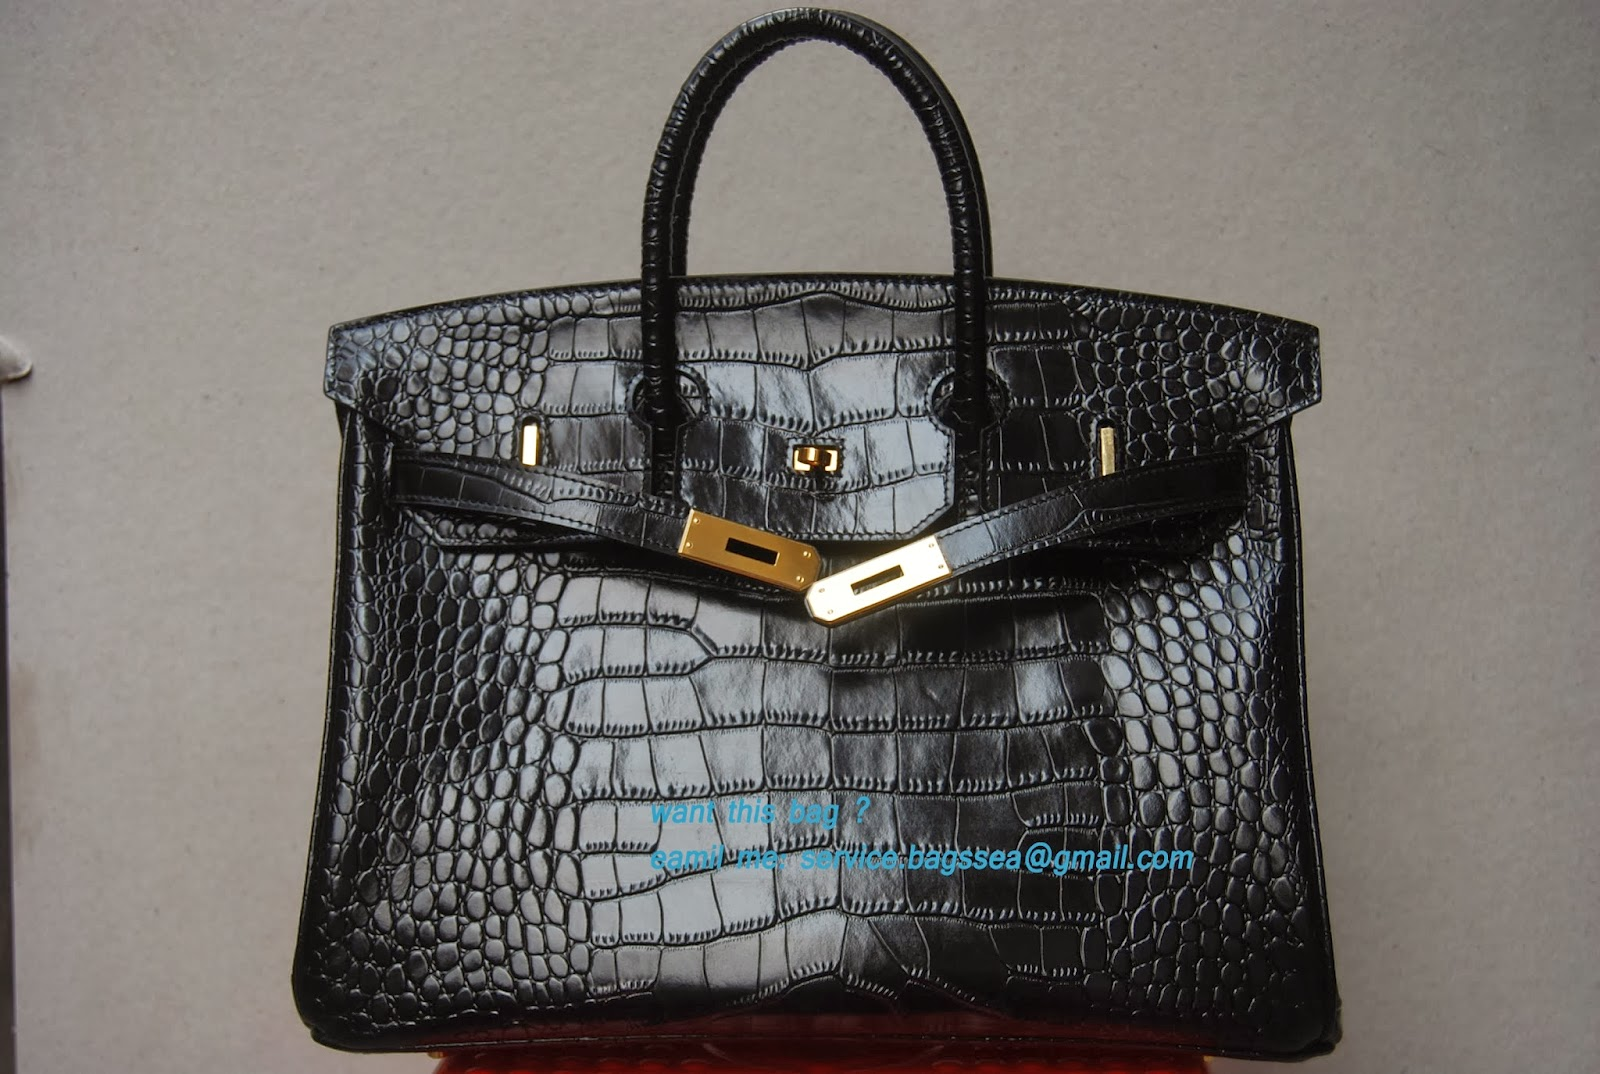 a32fcd1e90 hermes belts: Hermes birkin 30 shiny black crocodile leather with ...